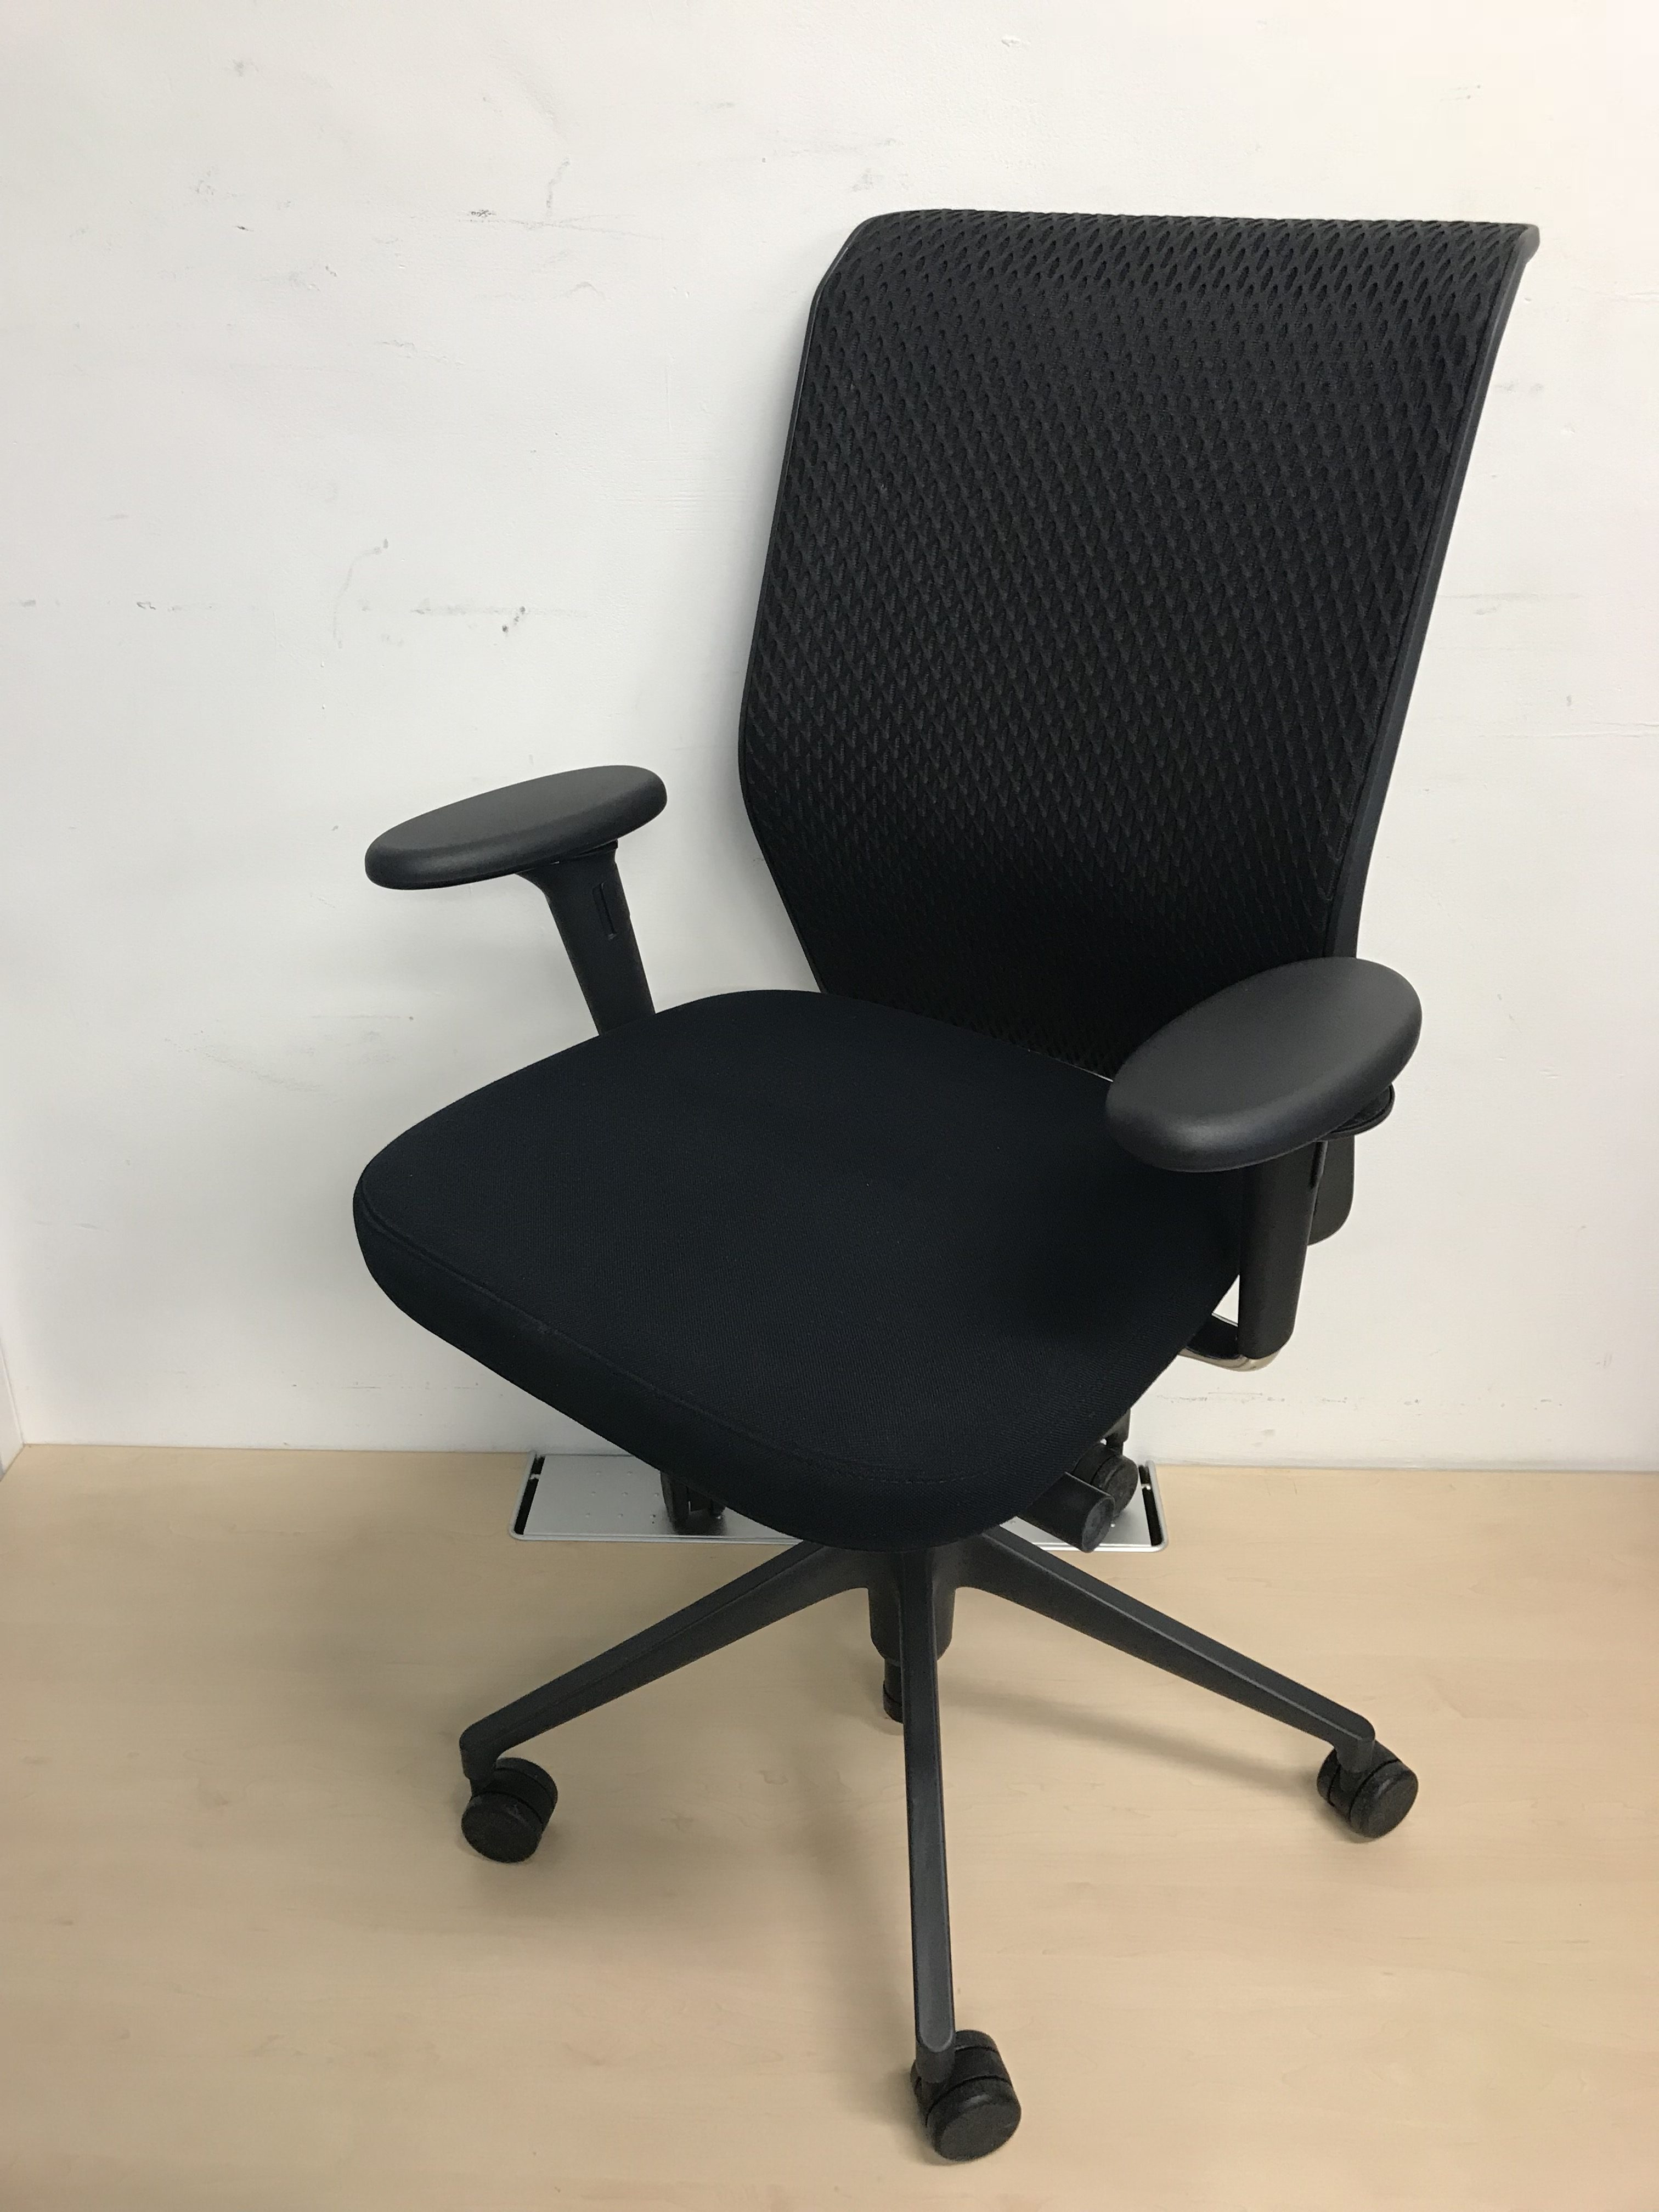 vitra id concept black mesh back ergonomic office chair 3d. Black Bedroom Furniture Sets. Home Design Ideas